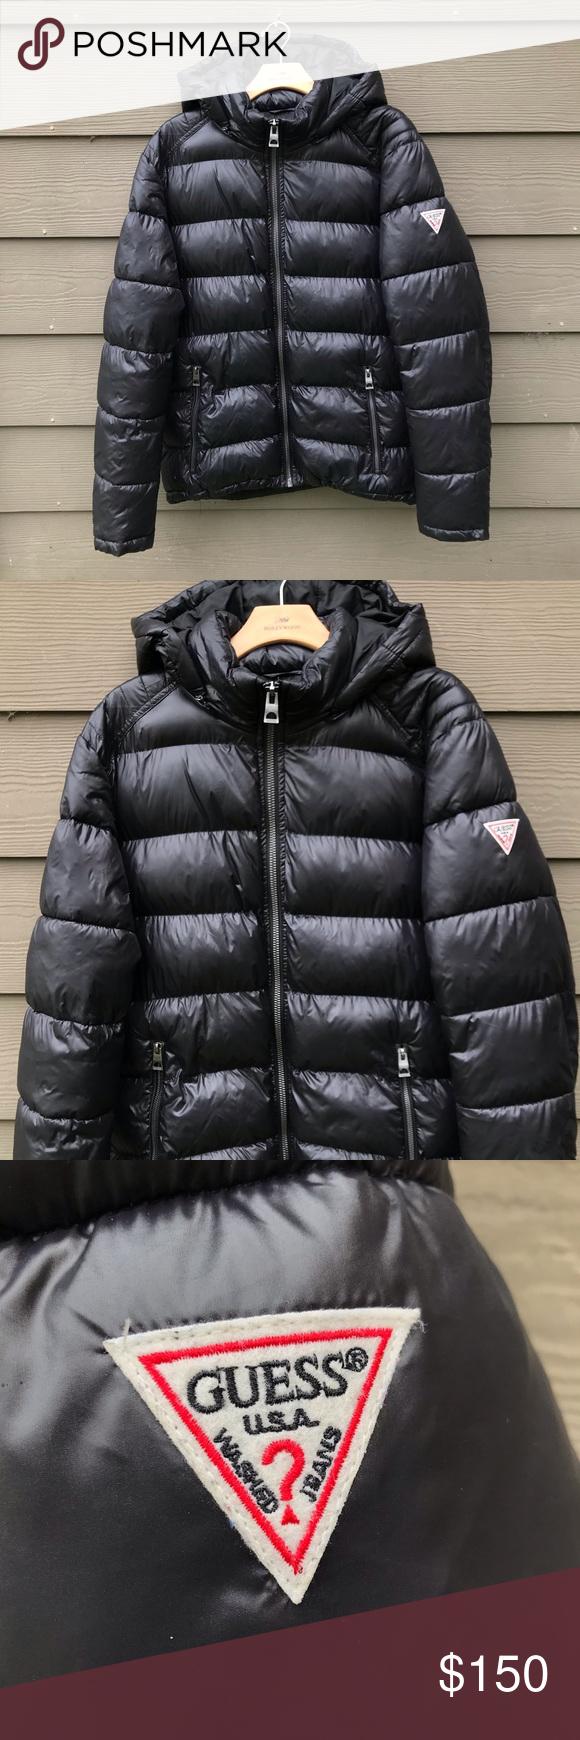 Men S Black Guess Puffer Jacket W Removable Hood Jackets Puffer Jackets Clothes Design [ 1740 x 580 Pixel ]